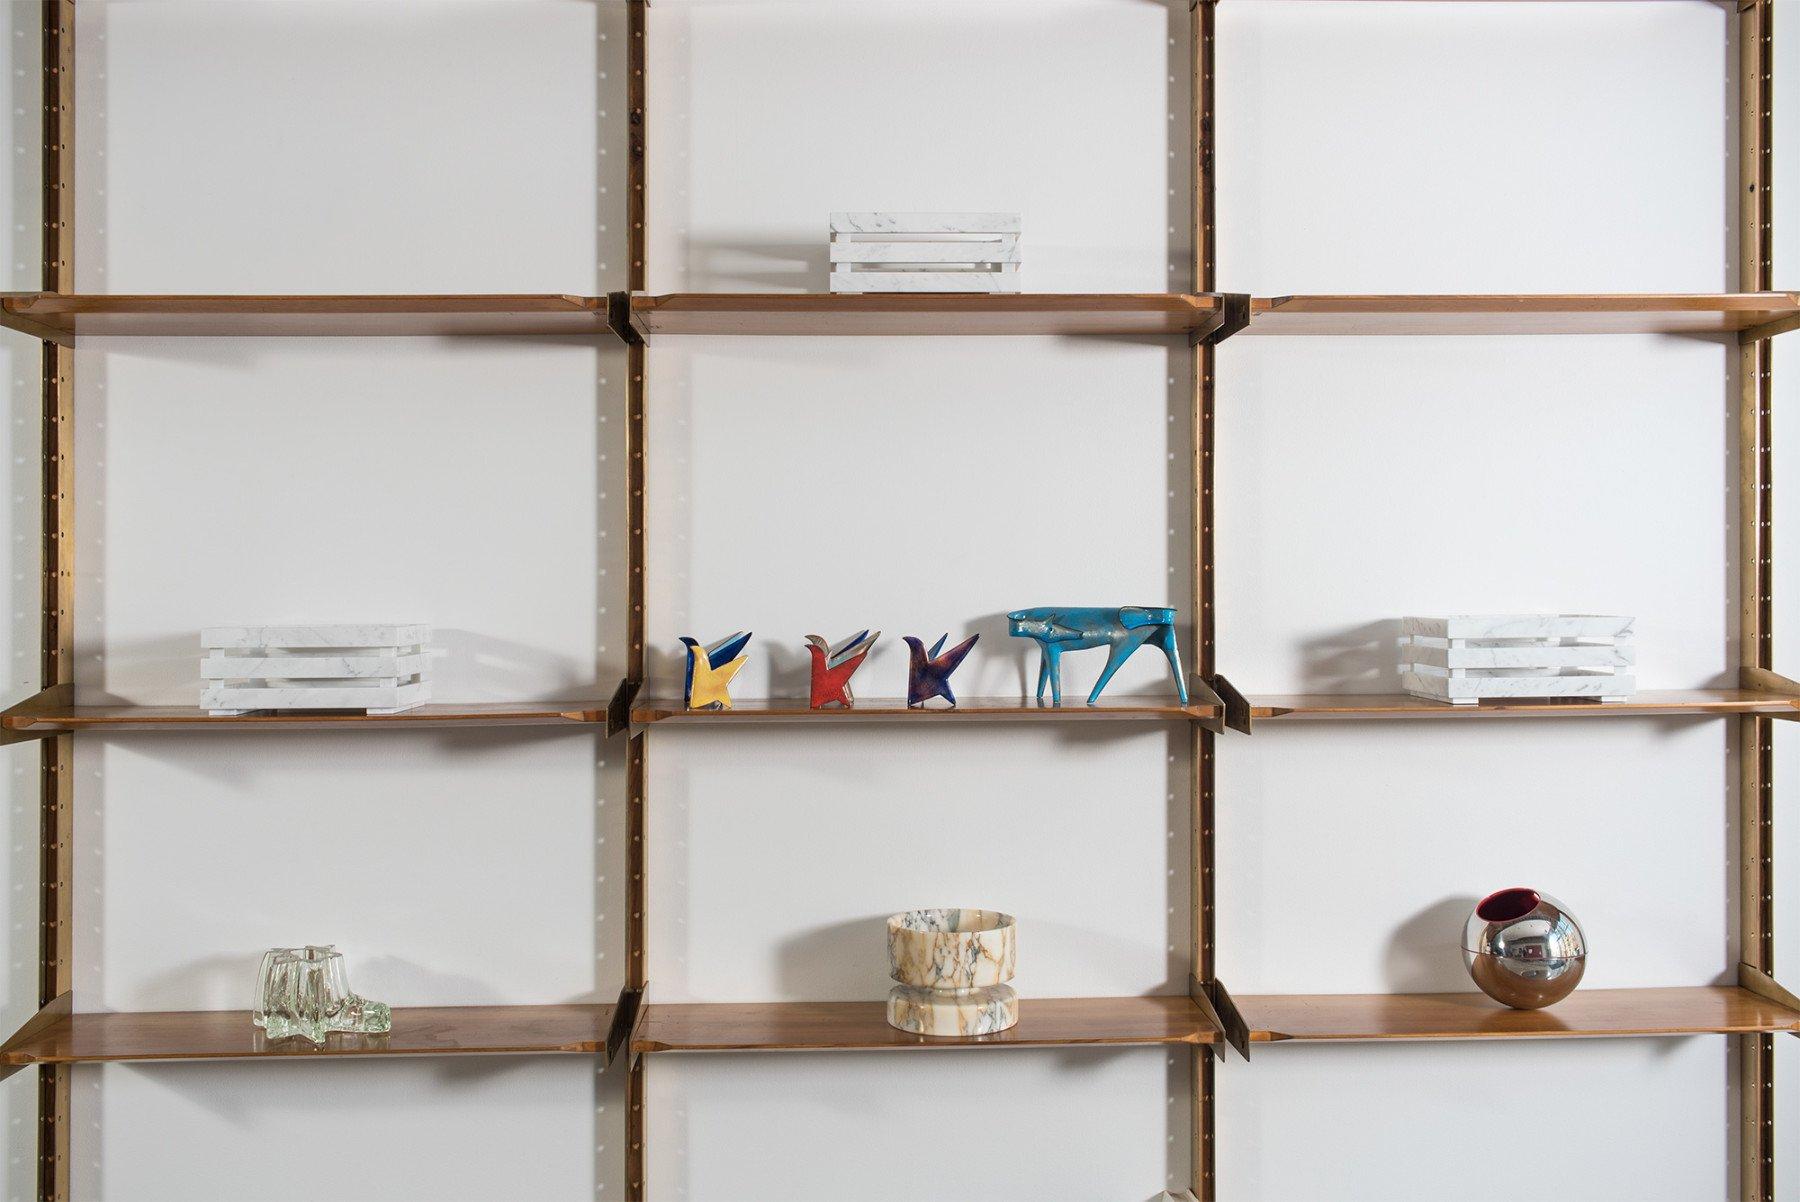 Pierluigi Spadolini |   Modular Shelving System/bookcase - Attributed to Pierluigi Spadolini